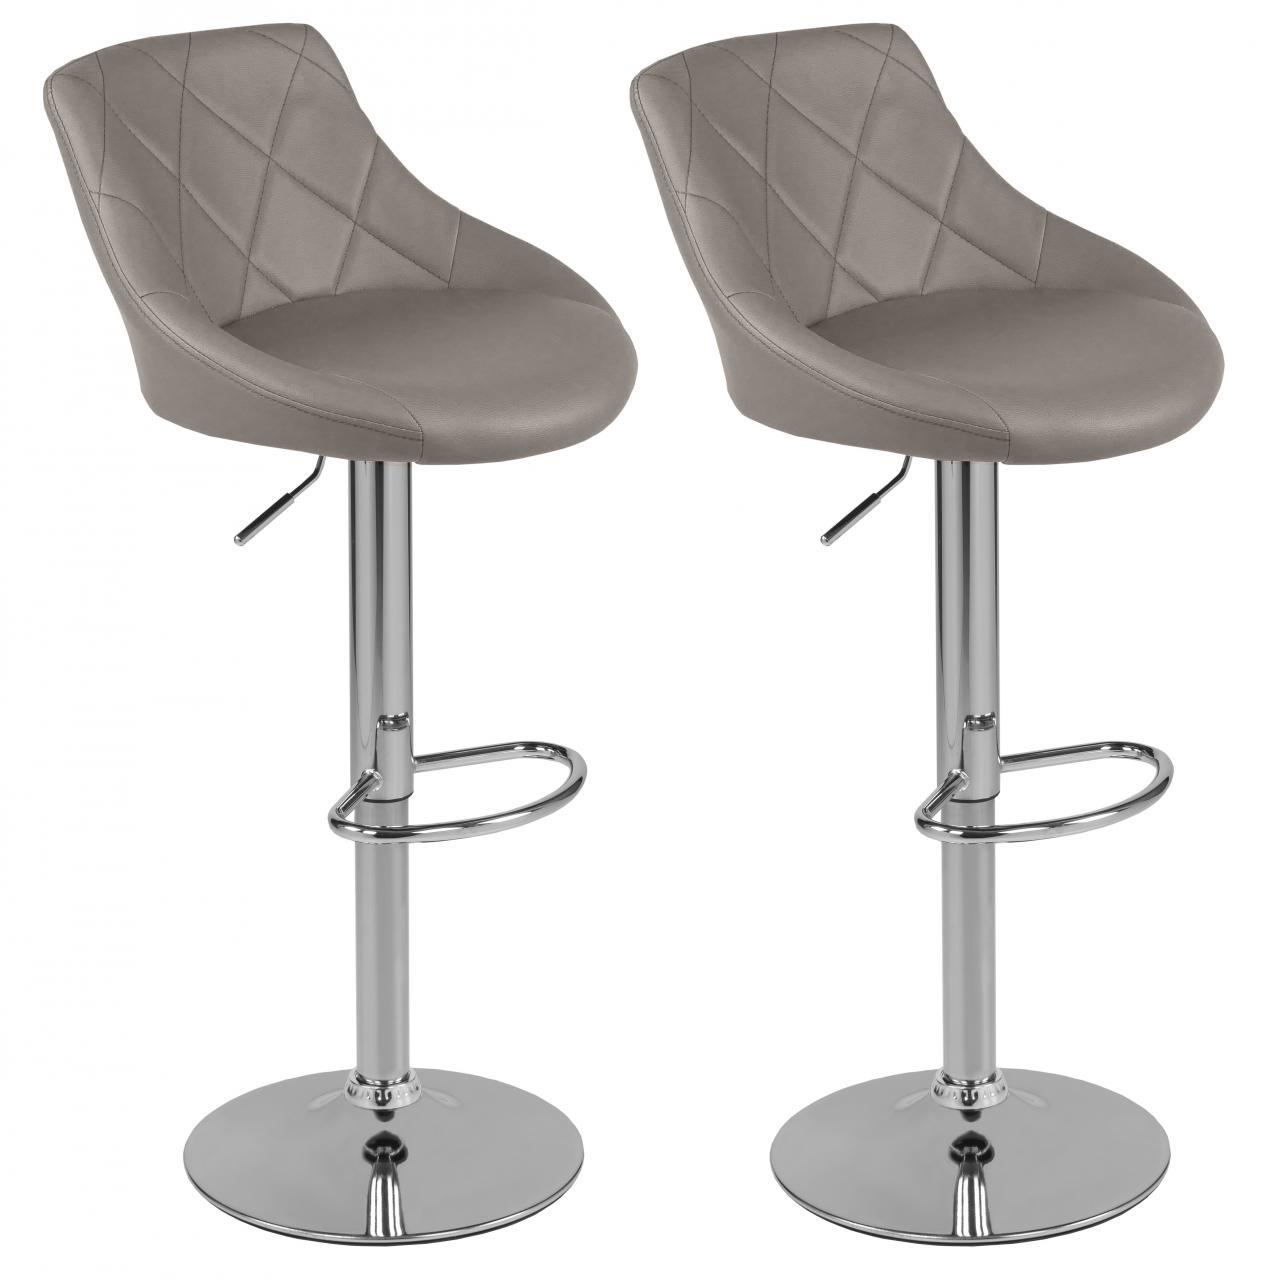 barhocker mit lehne 2er set bar stuhl tresenhocker drehhocker k chenhocker ebay. Black Bedroom Furniture Sets. Home Design Ideas